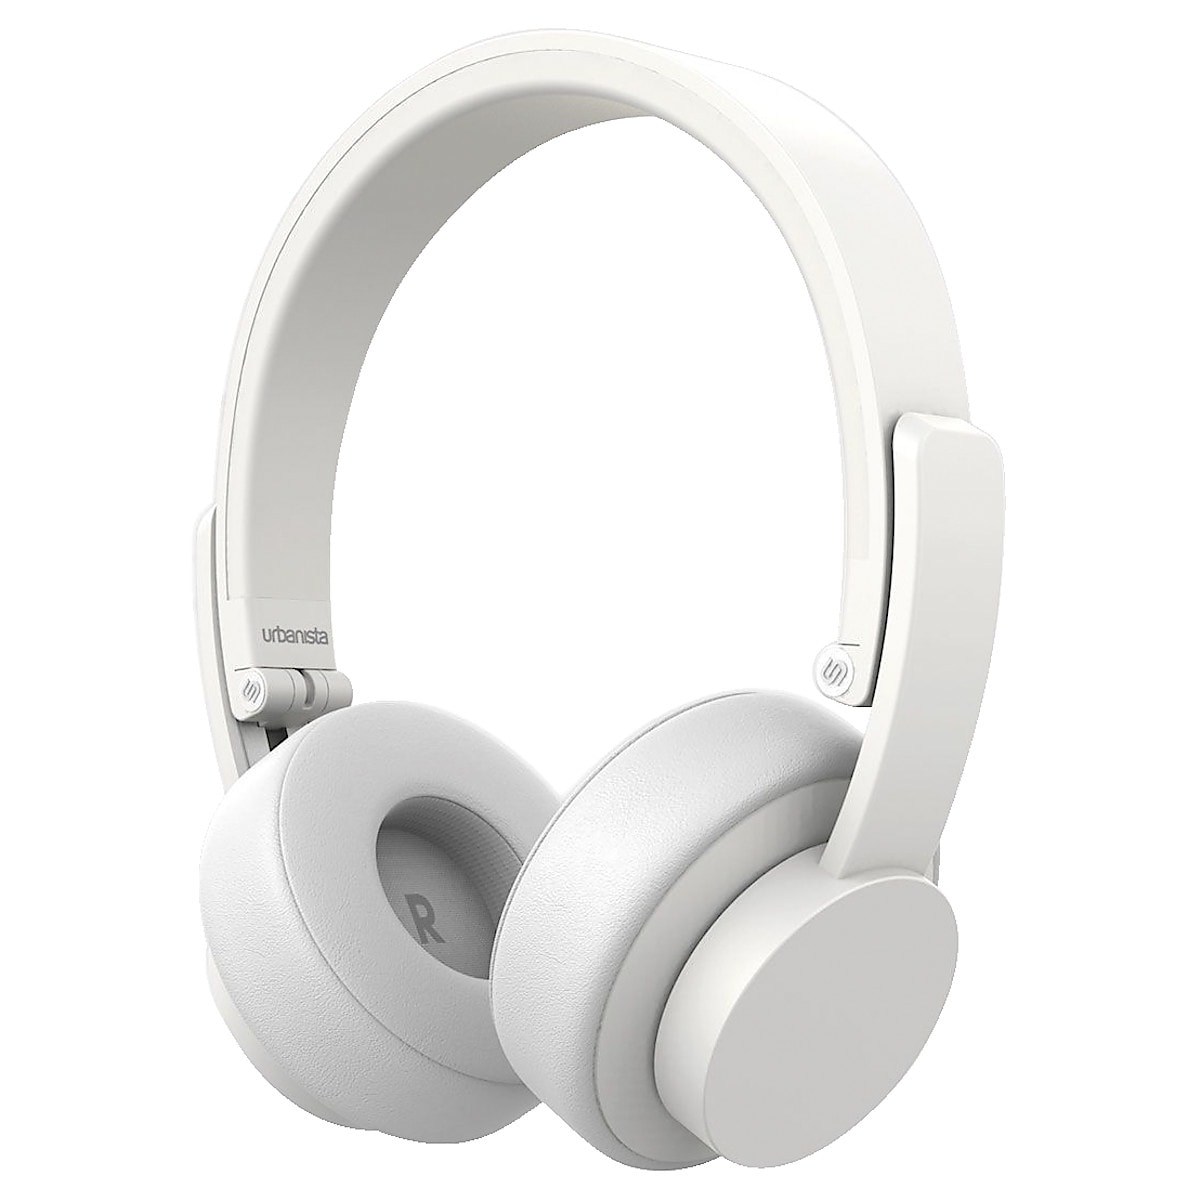 Urbanista Seattle Wireless Headphones with Microphone